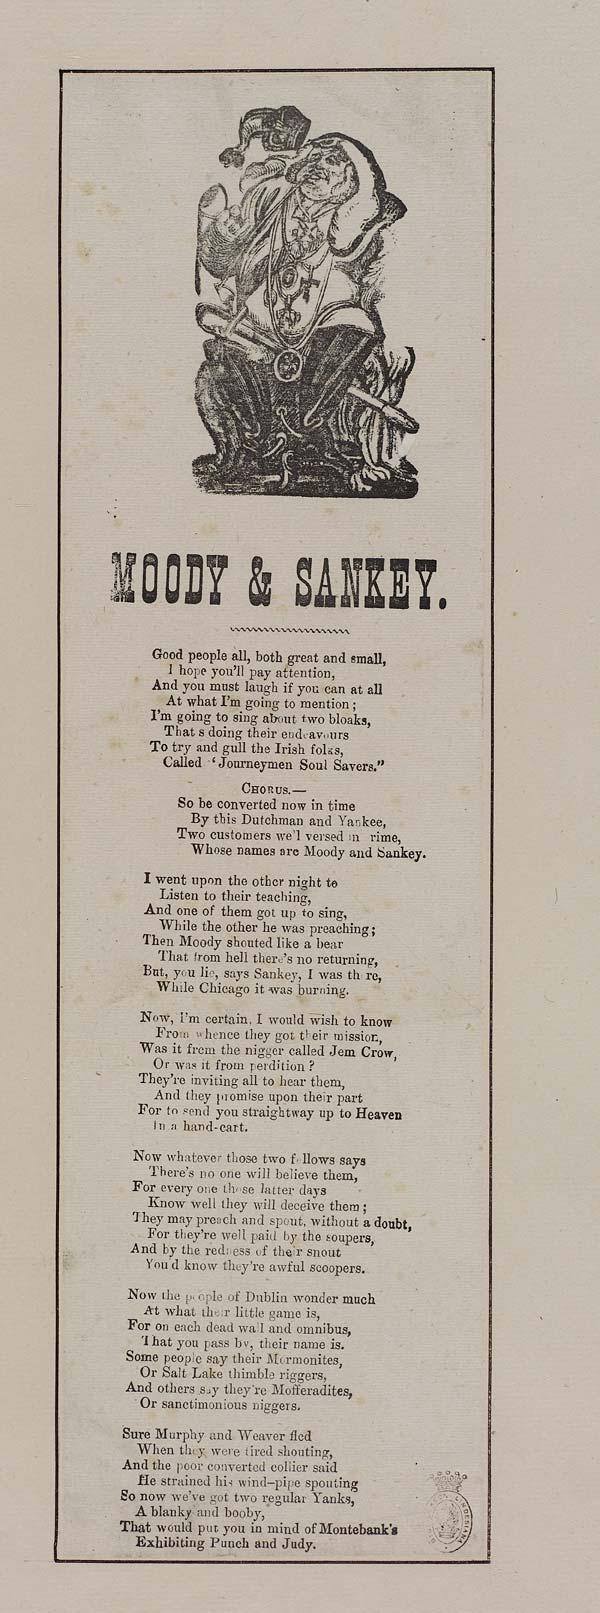 (32) Moody & Sankey